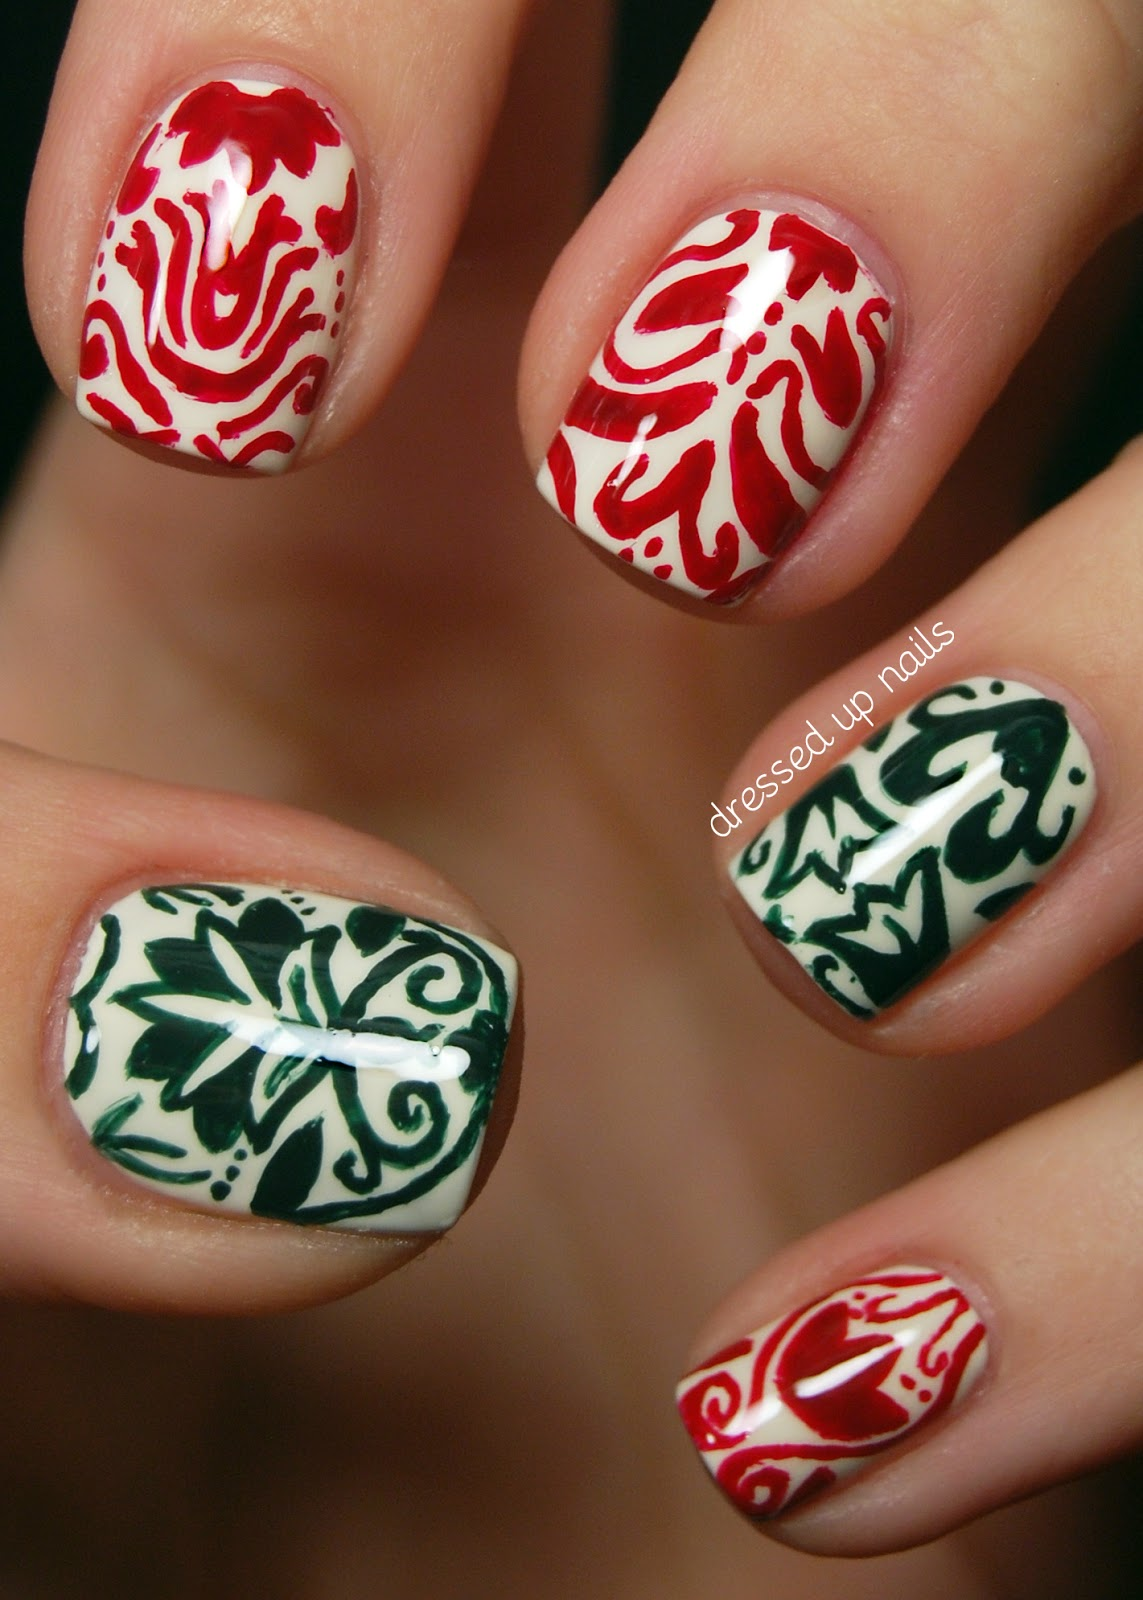 Nail Art Design For Xmas ~ Christmas nail art designs design